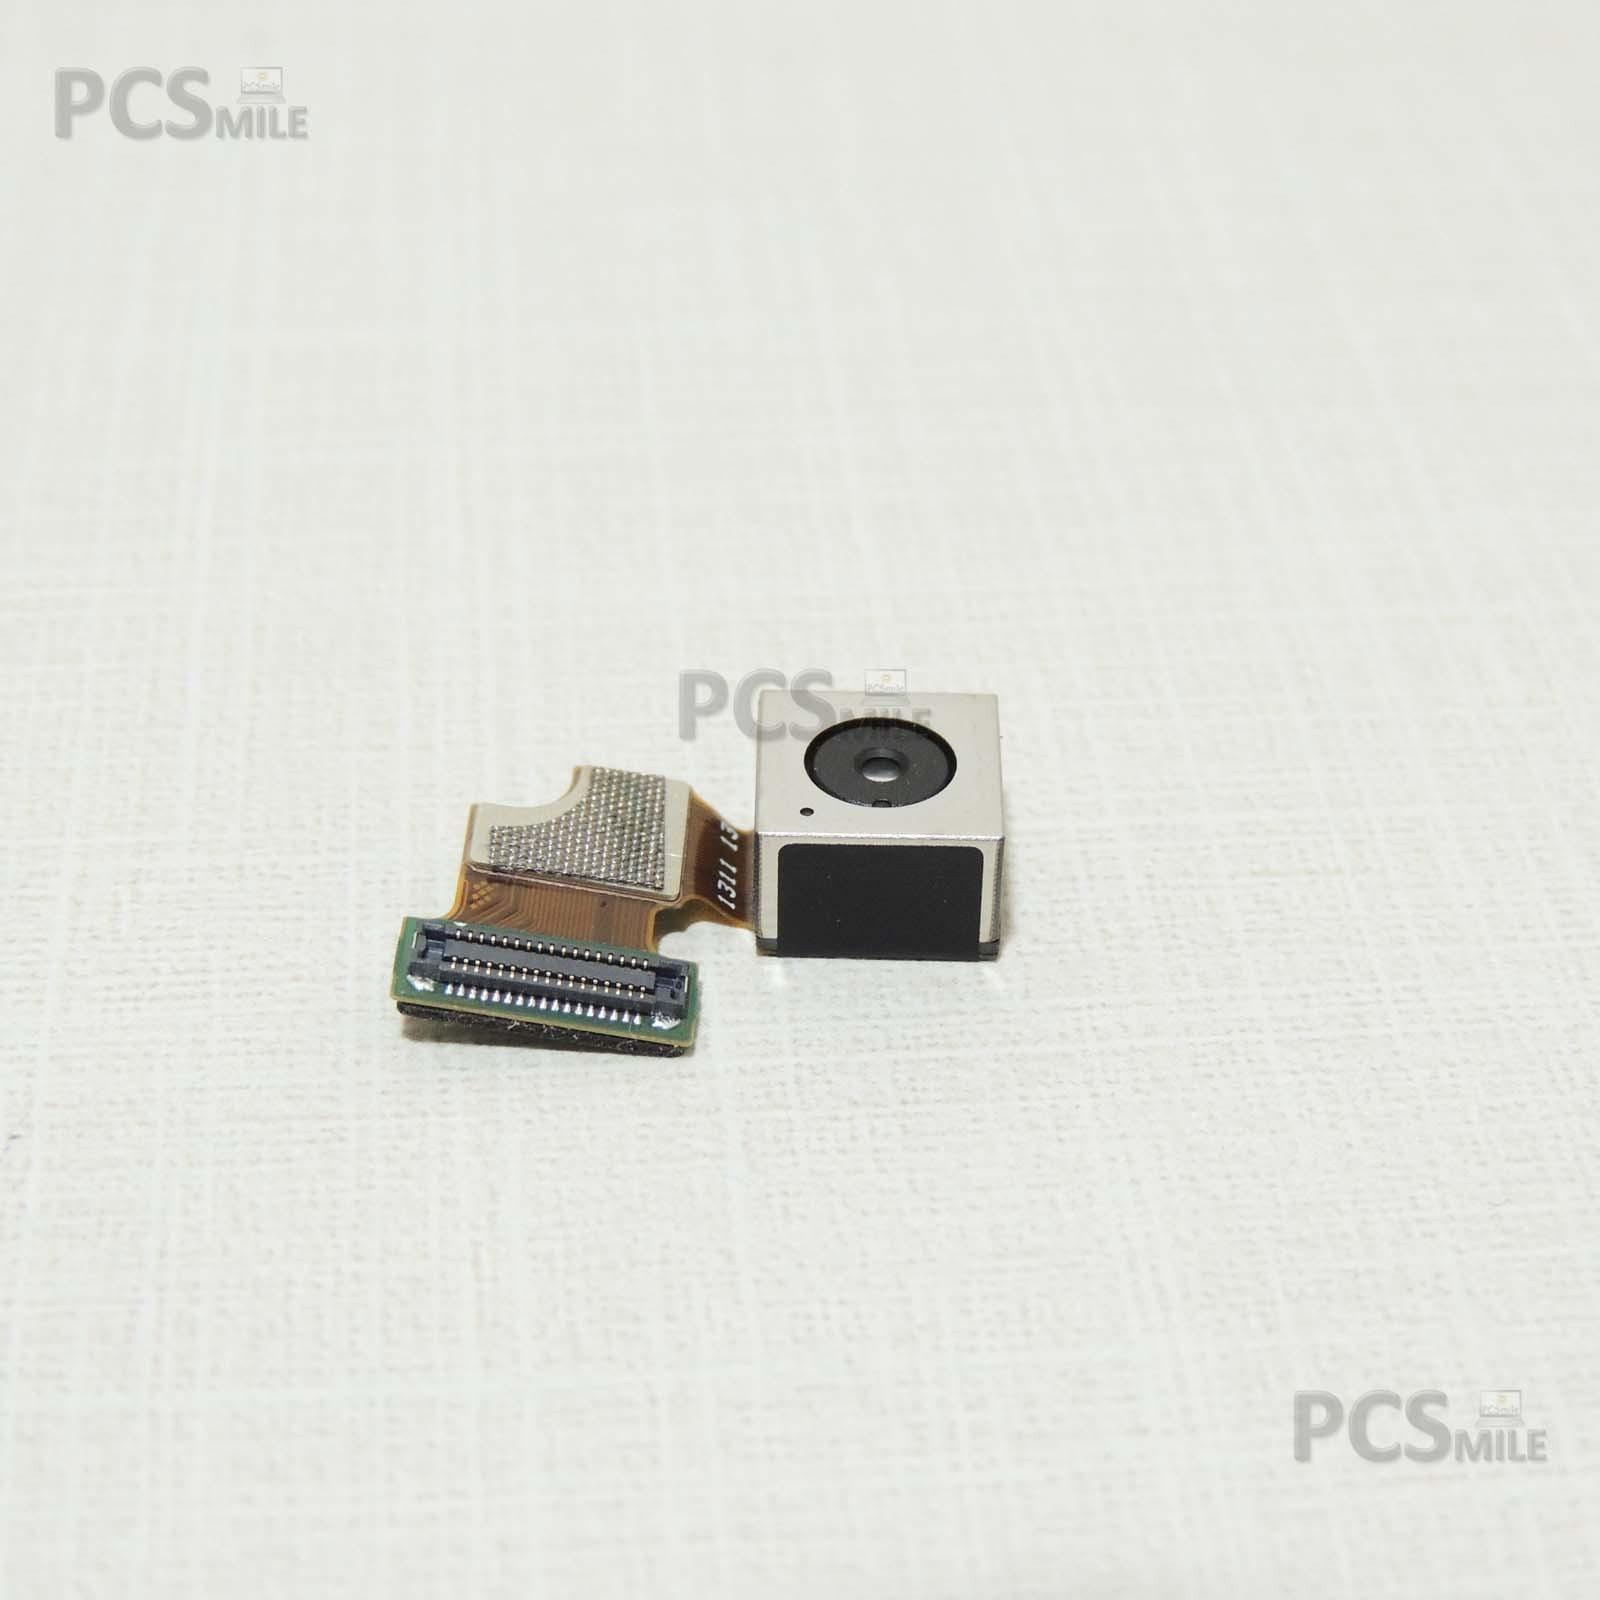 Fotocamera principale Samsung Galaxy S3 GT-i9300 Galaxy S III camera posteriore